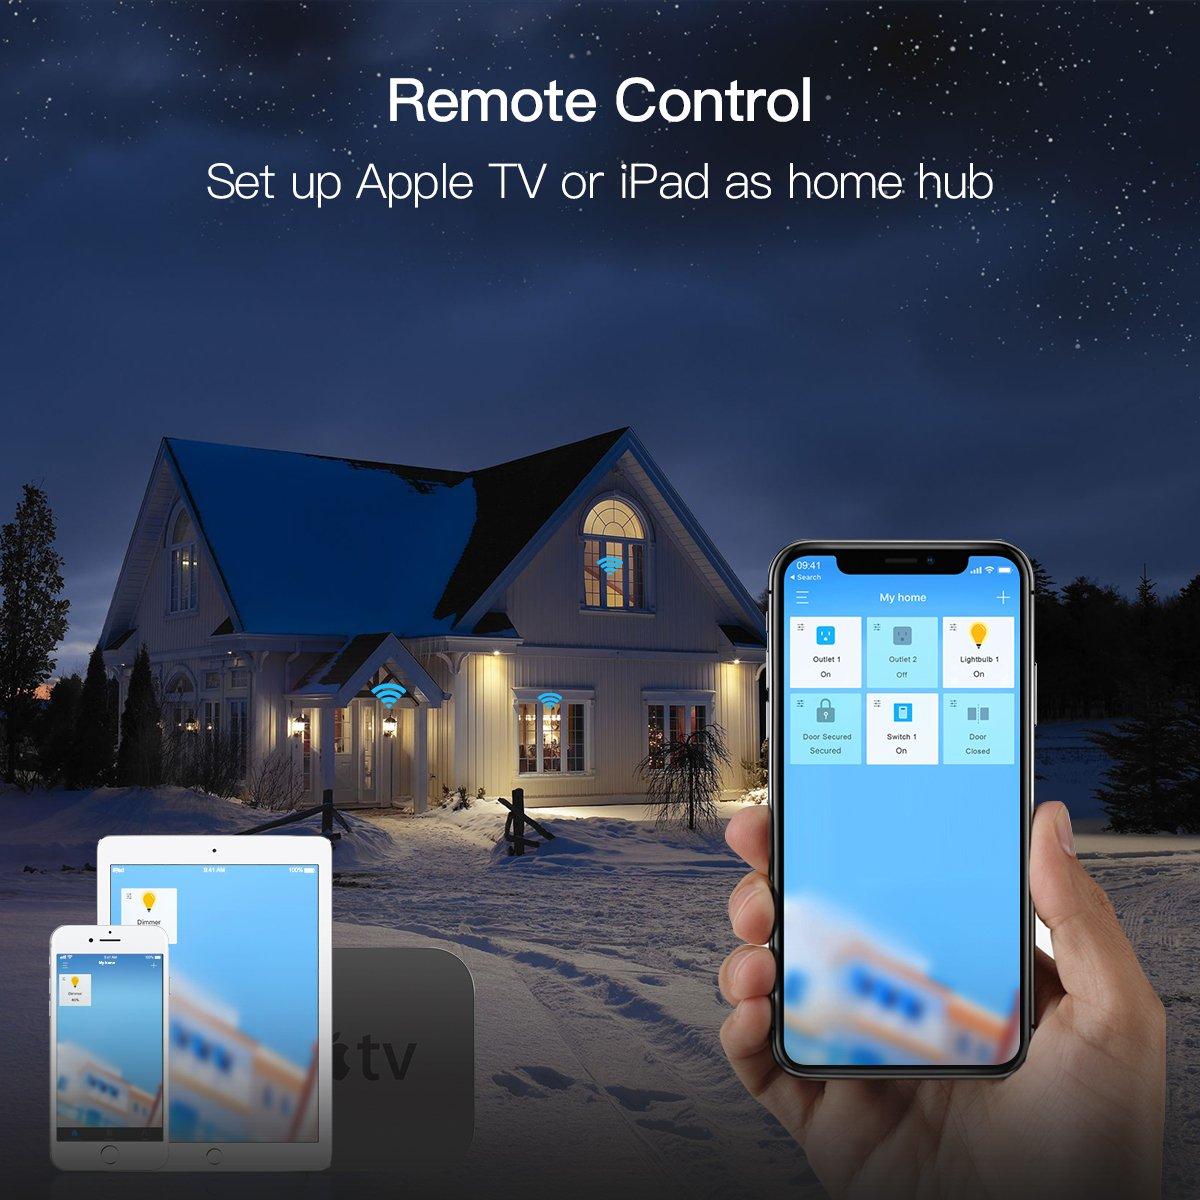 Koogeek Smart Socket WiFi Enabled E26 Light Bulb Adapter Works with Apple HomeKit Support Siri Voice Control Home App on 2.4Ghz Network by Koogeek (Image #5)